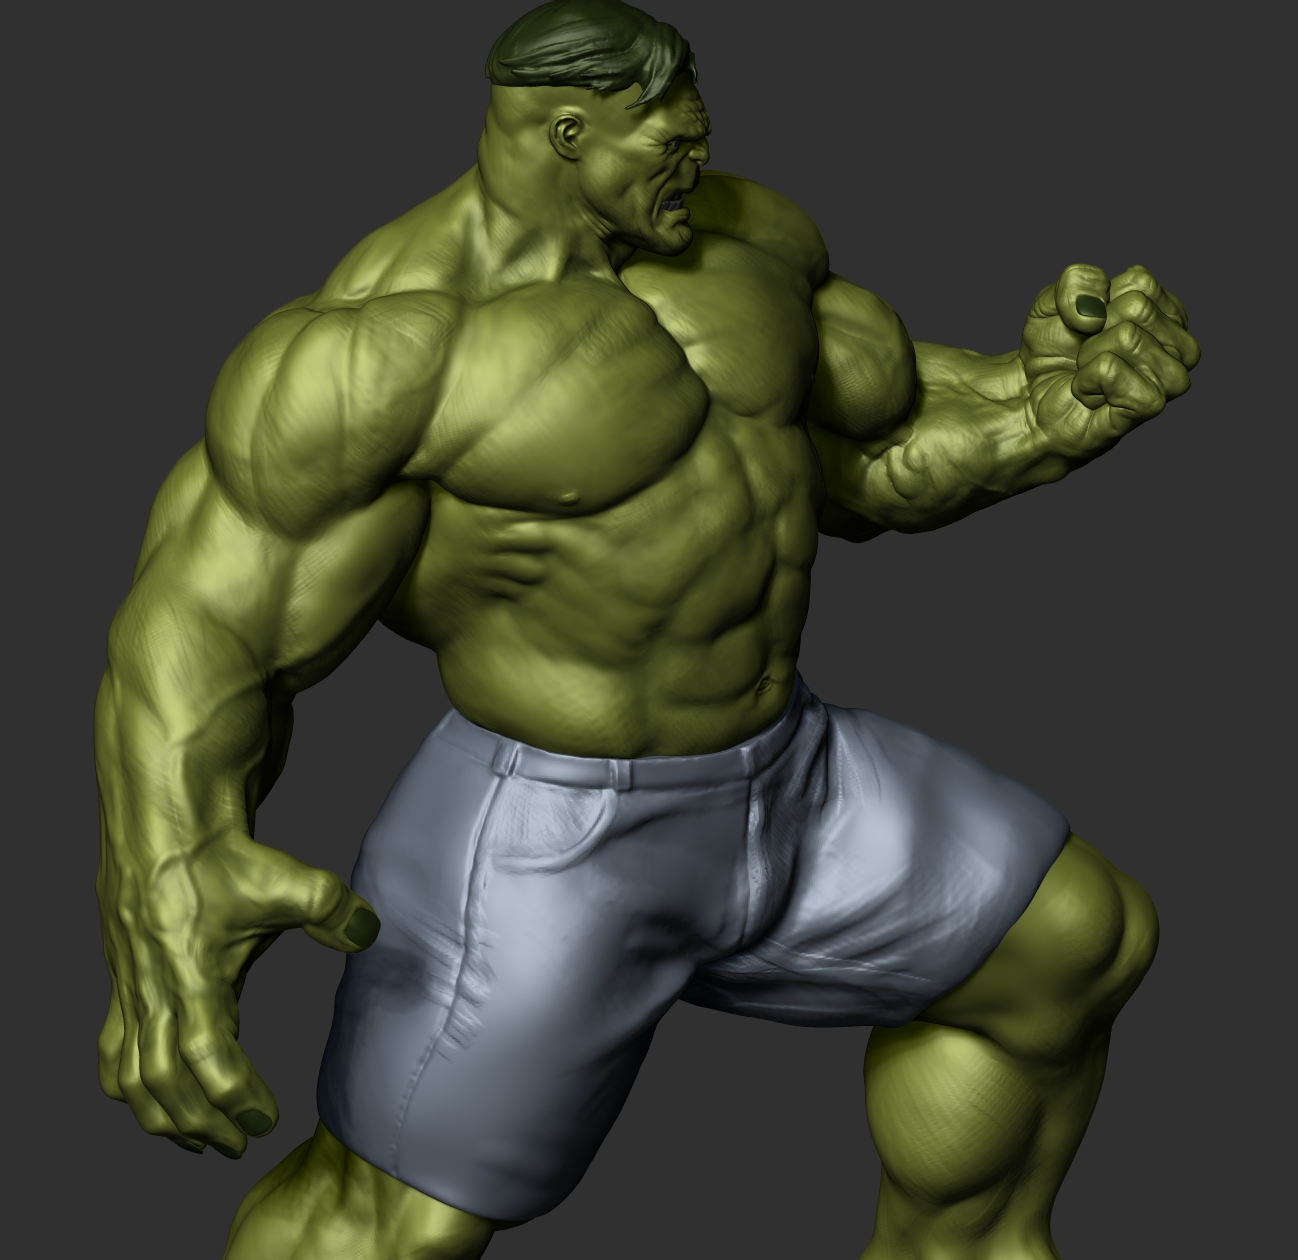 Giochi di hulk 3